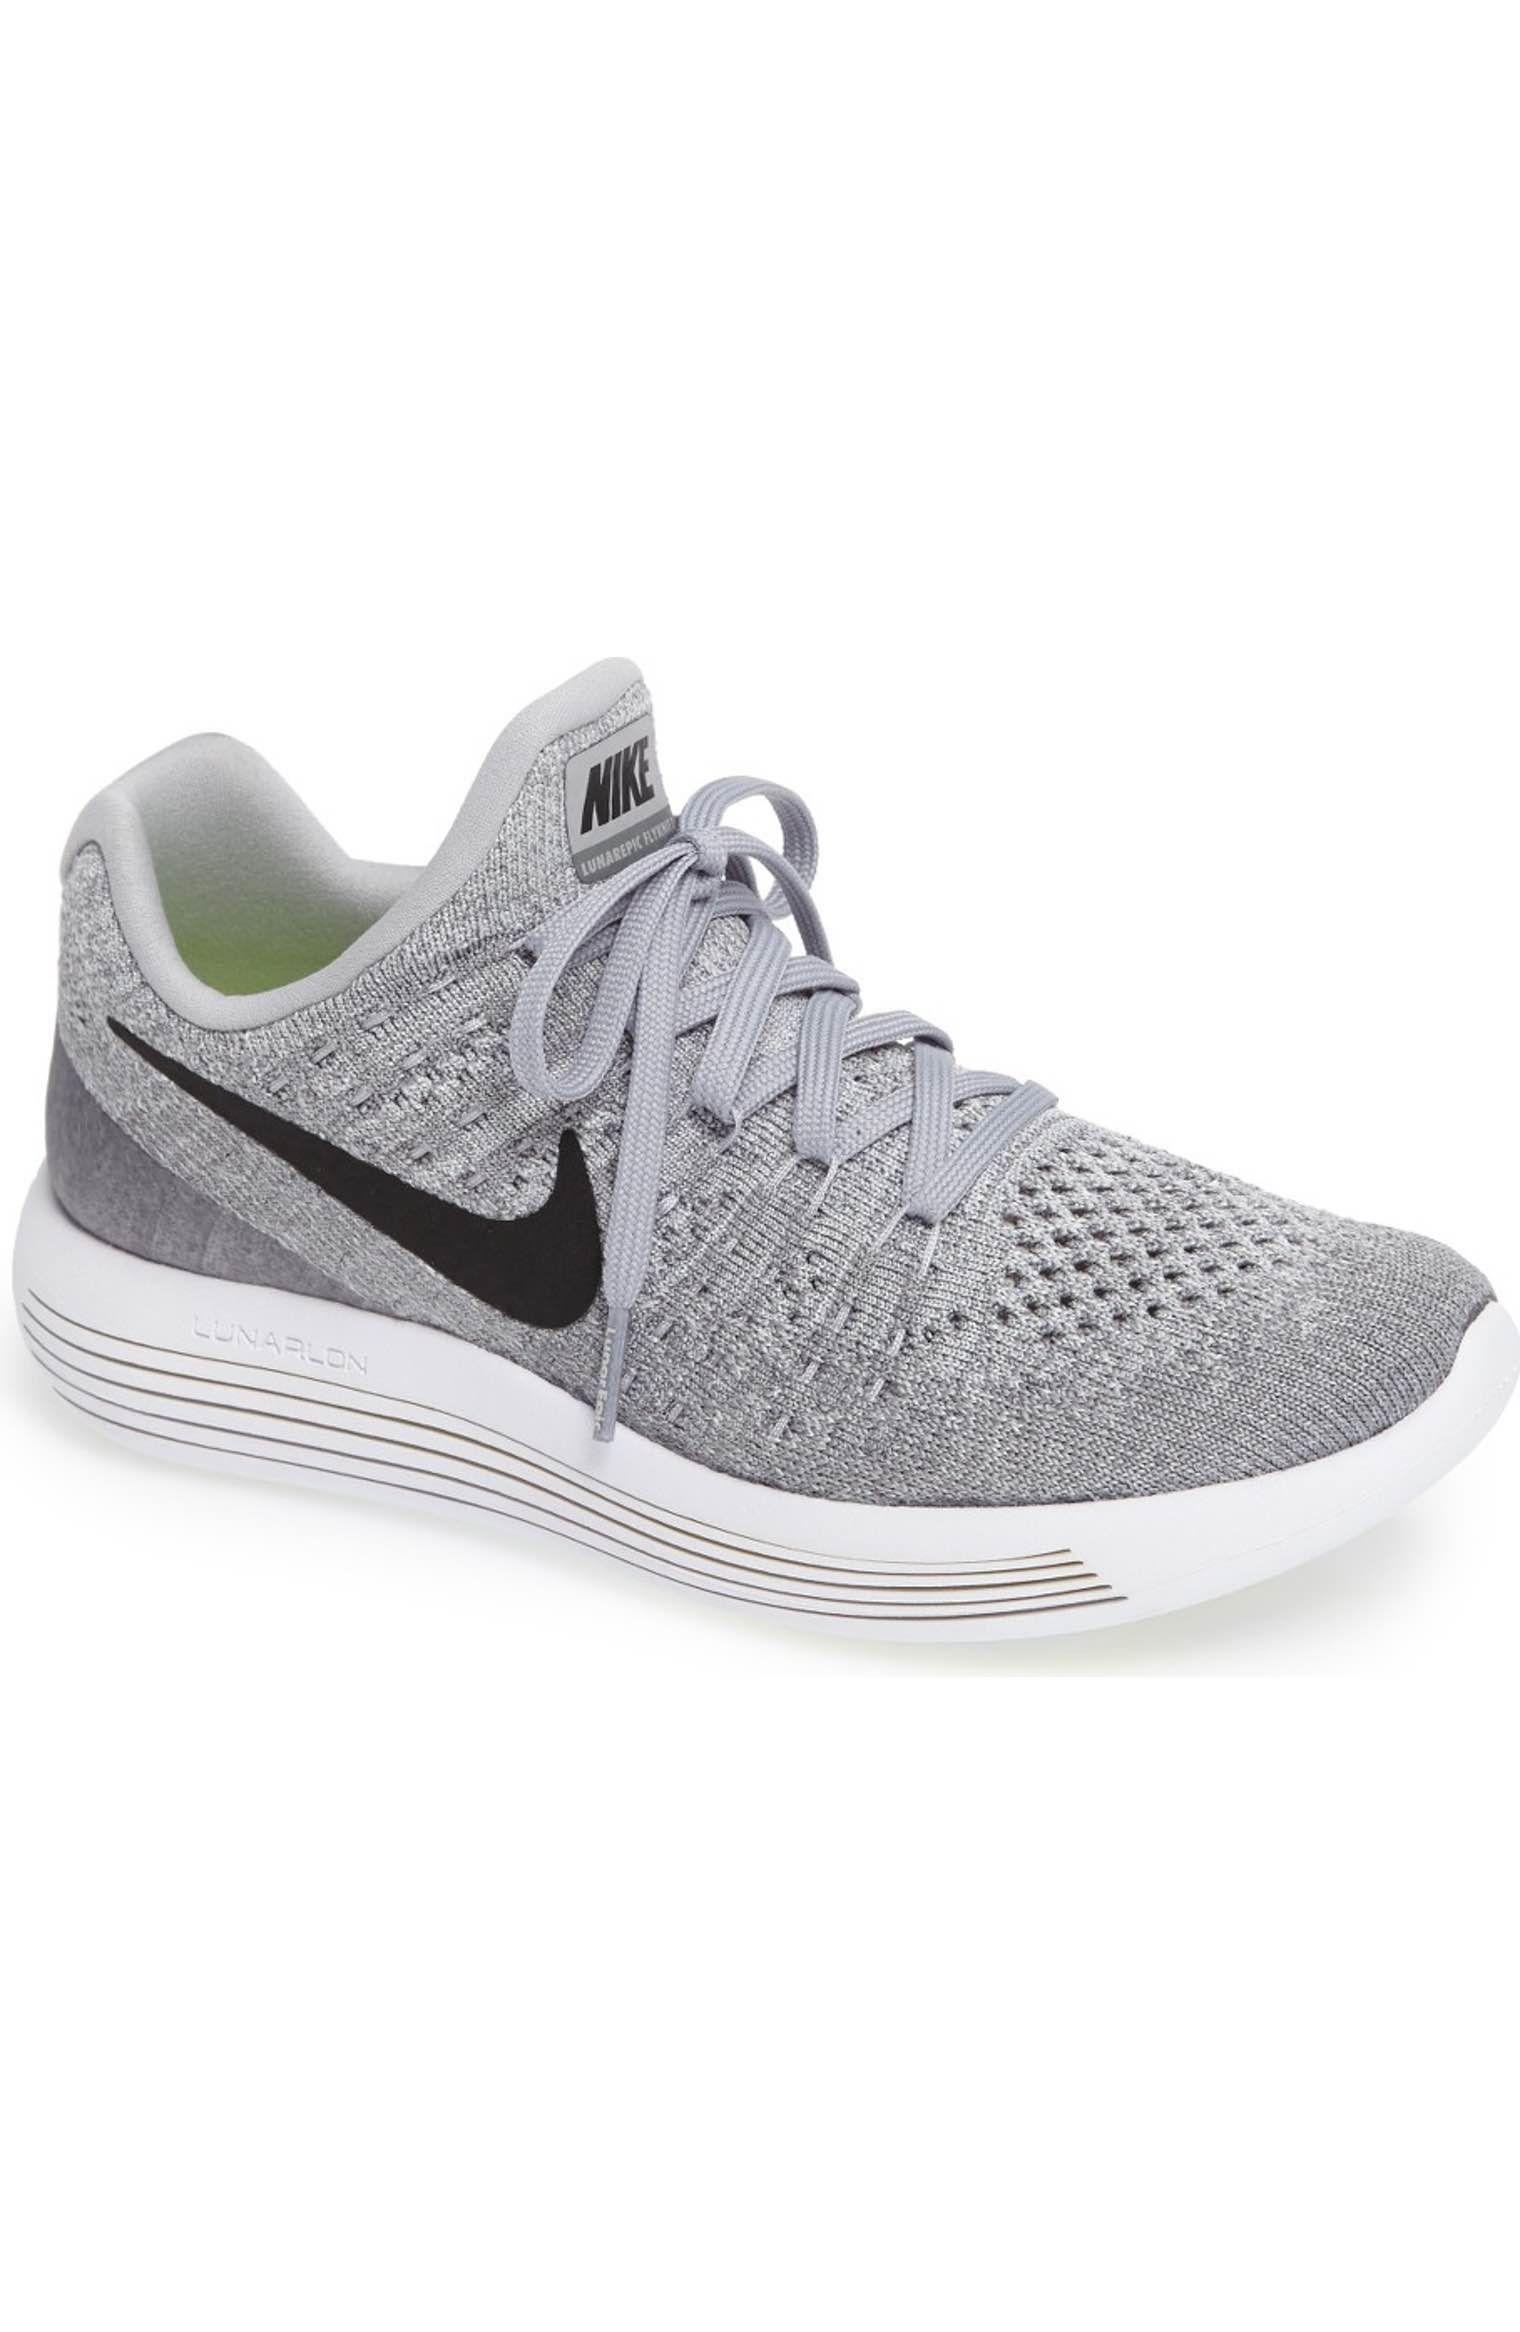 Nike Lunarepic Low Flyknit 2 Running Shoe Women Running Shoes Nike Running Shoes Nike